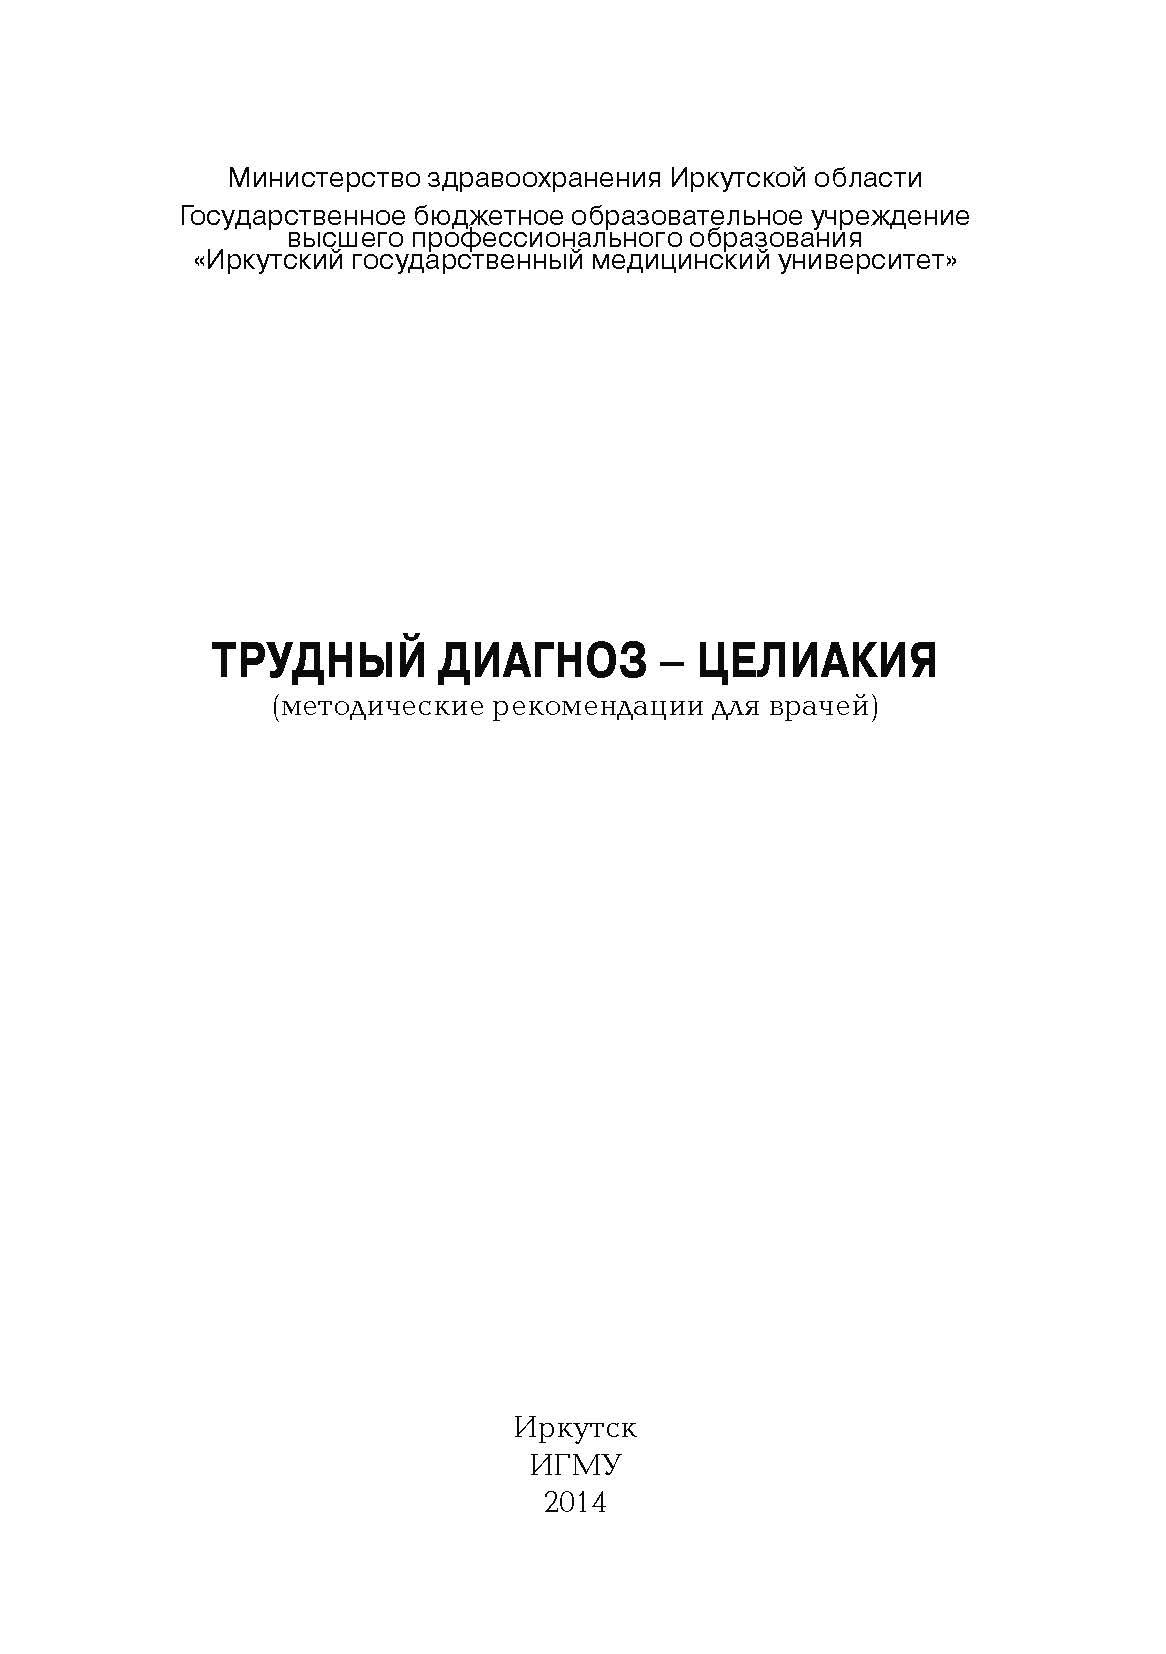 Анциферова_2014